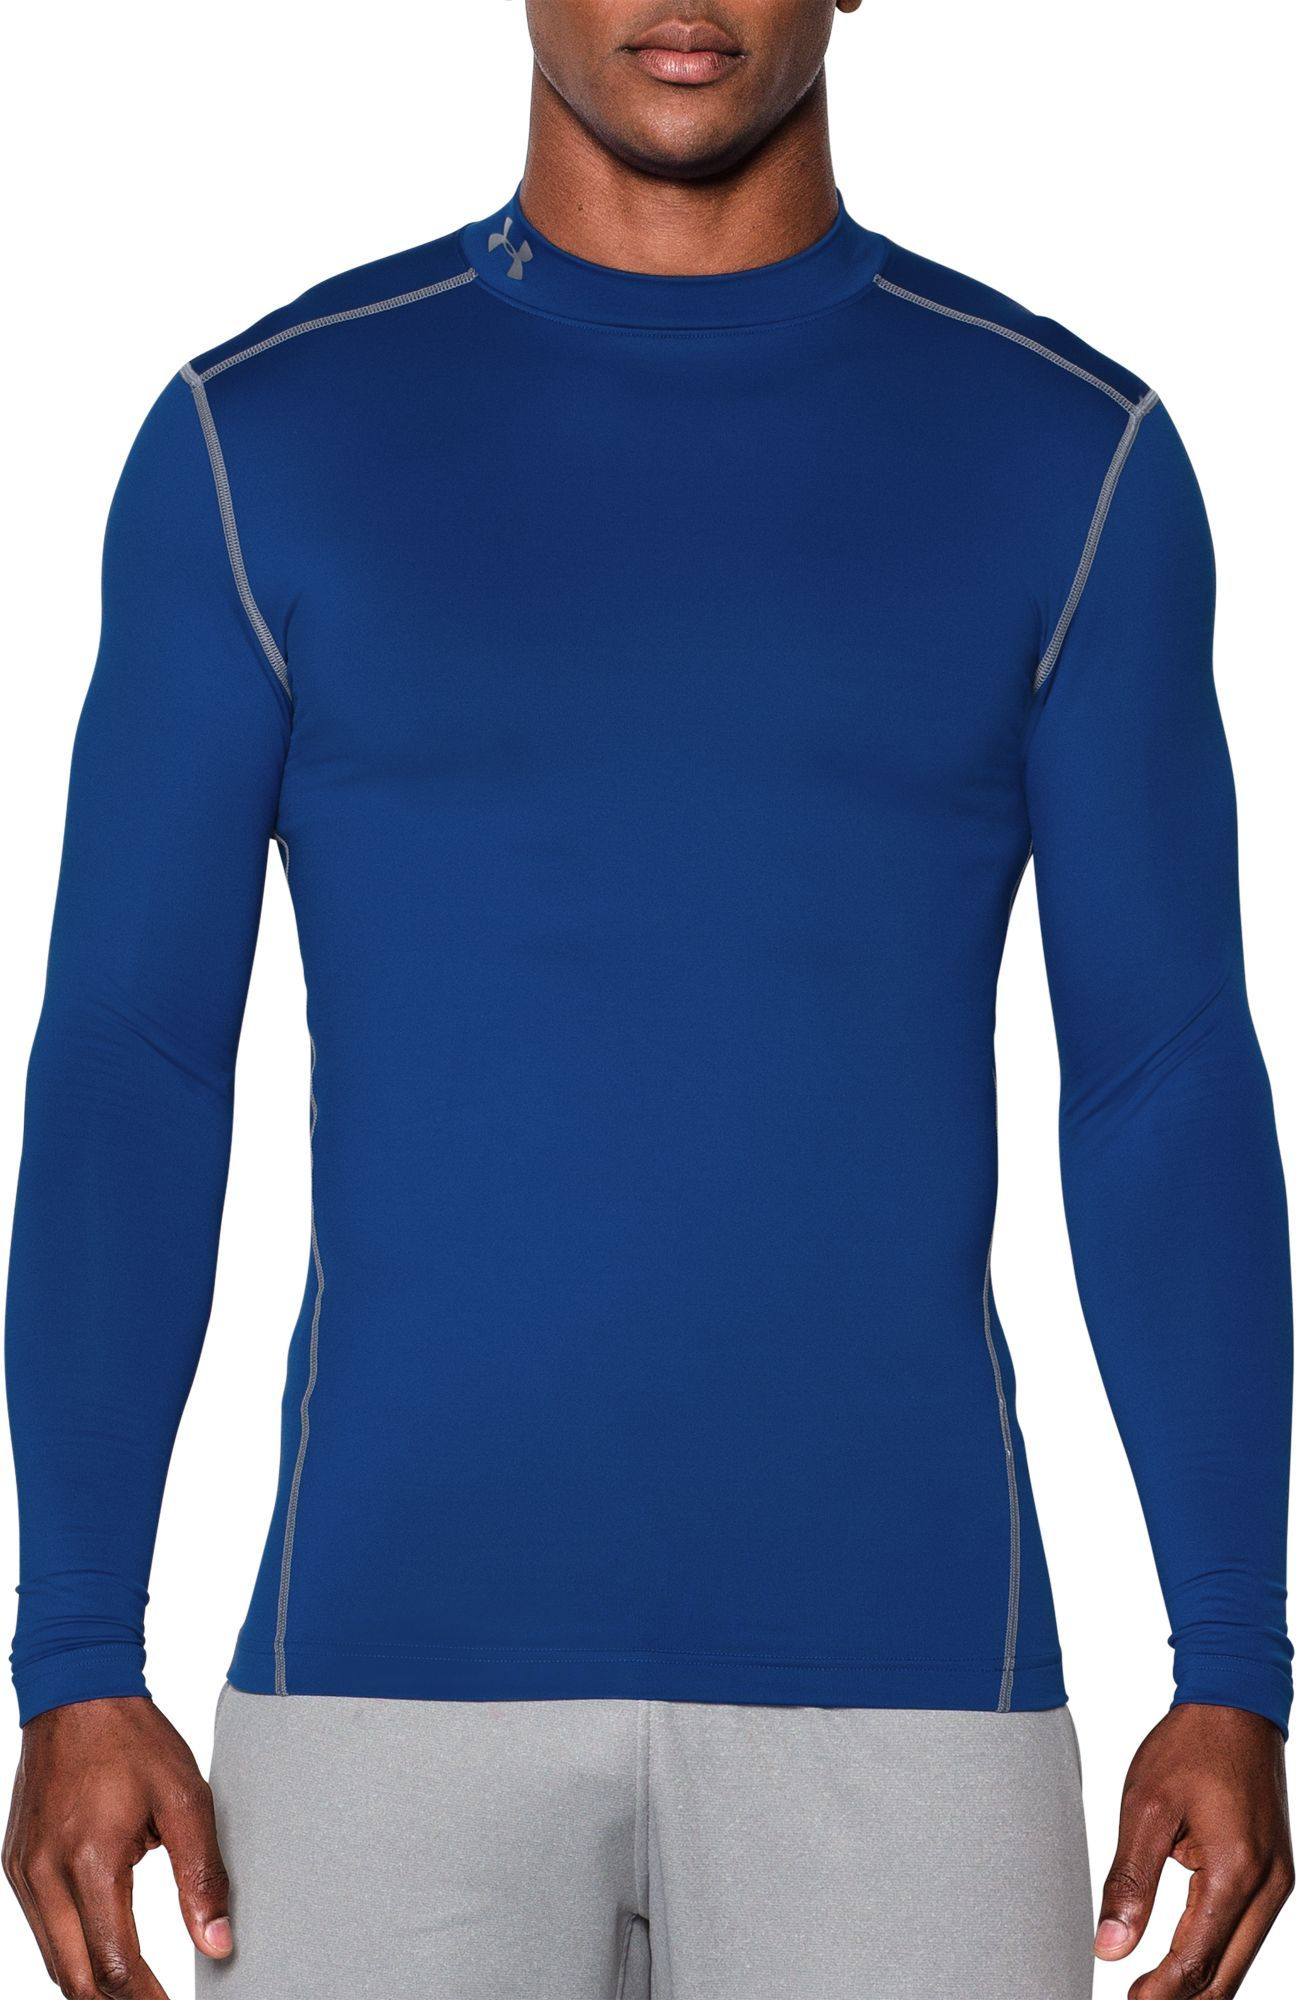 e2e7ea972 Under Armour Men's ColdGear Armour Compression Mock Neck Long Sleeve Shirt,  Size: 4XT, Royal/Silver